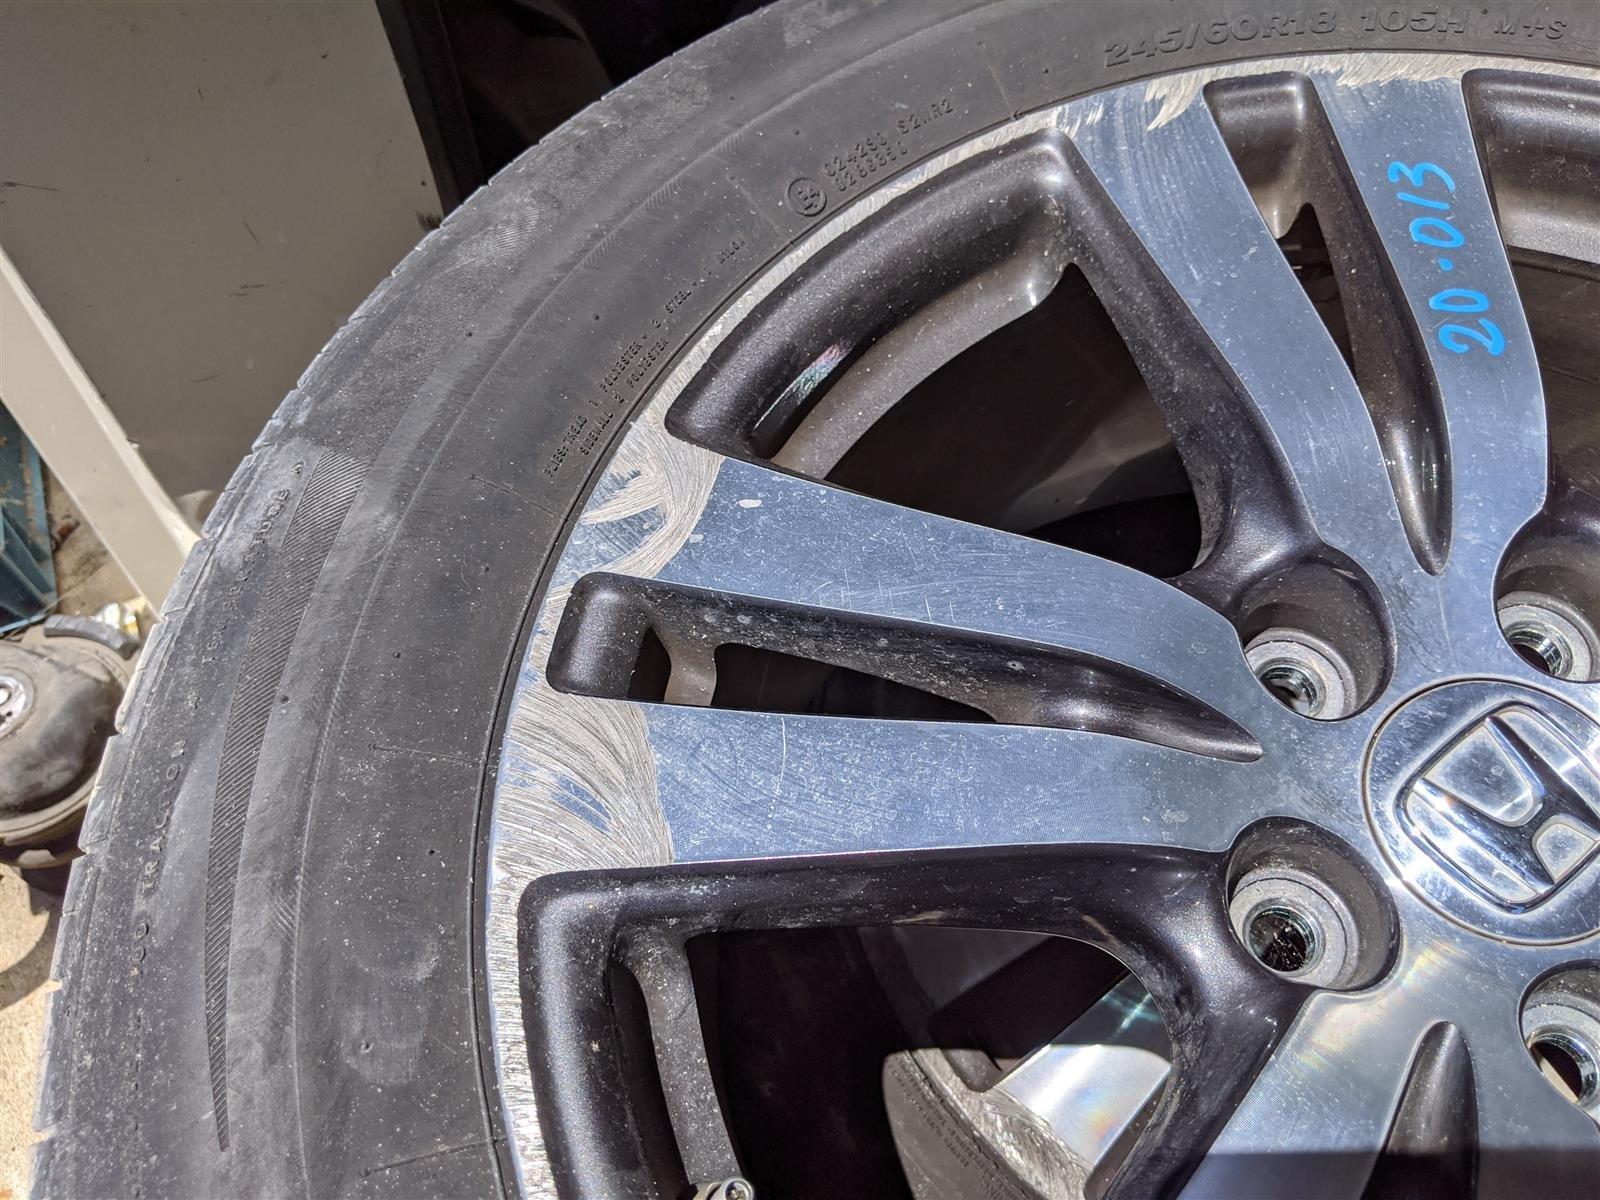 2016 Honda Pilot 18 Inch Alloy Wheel Rim 2 Replacement